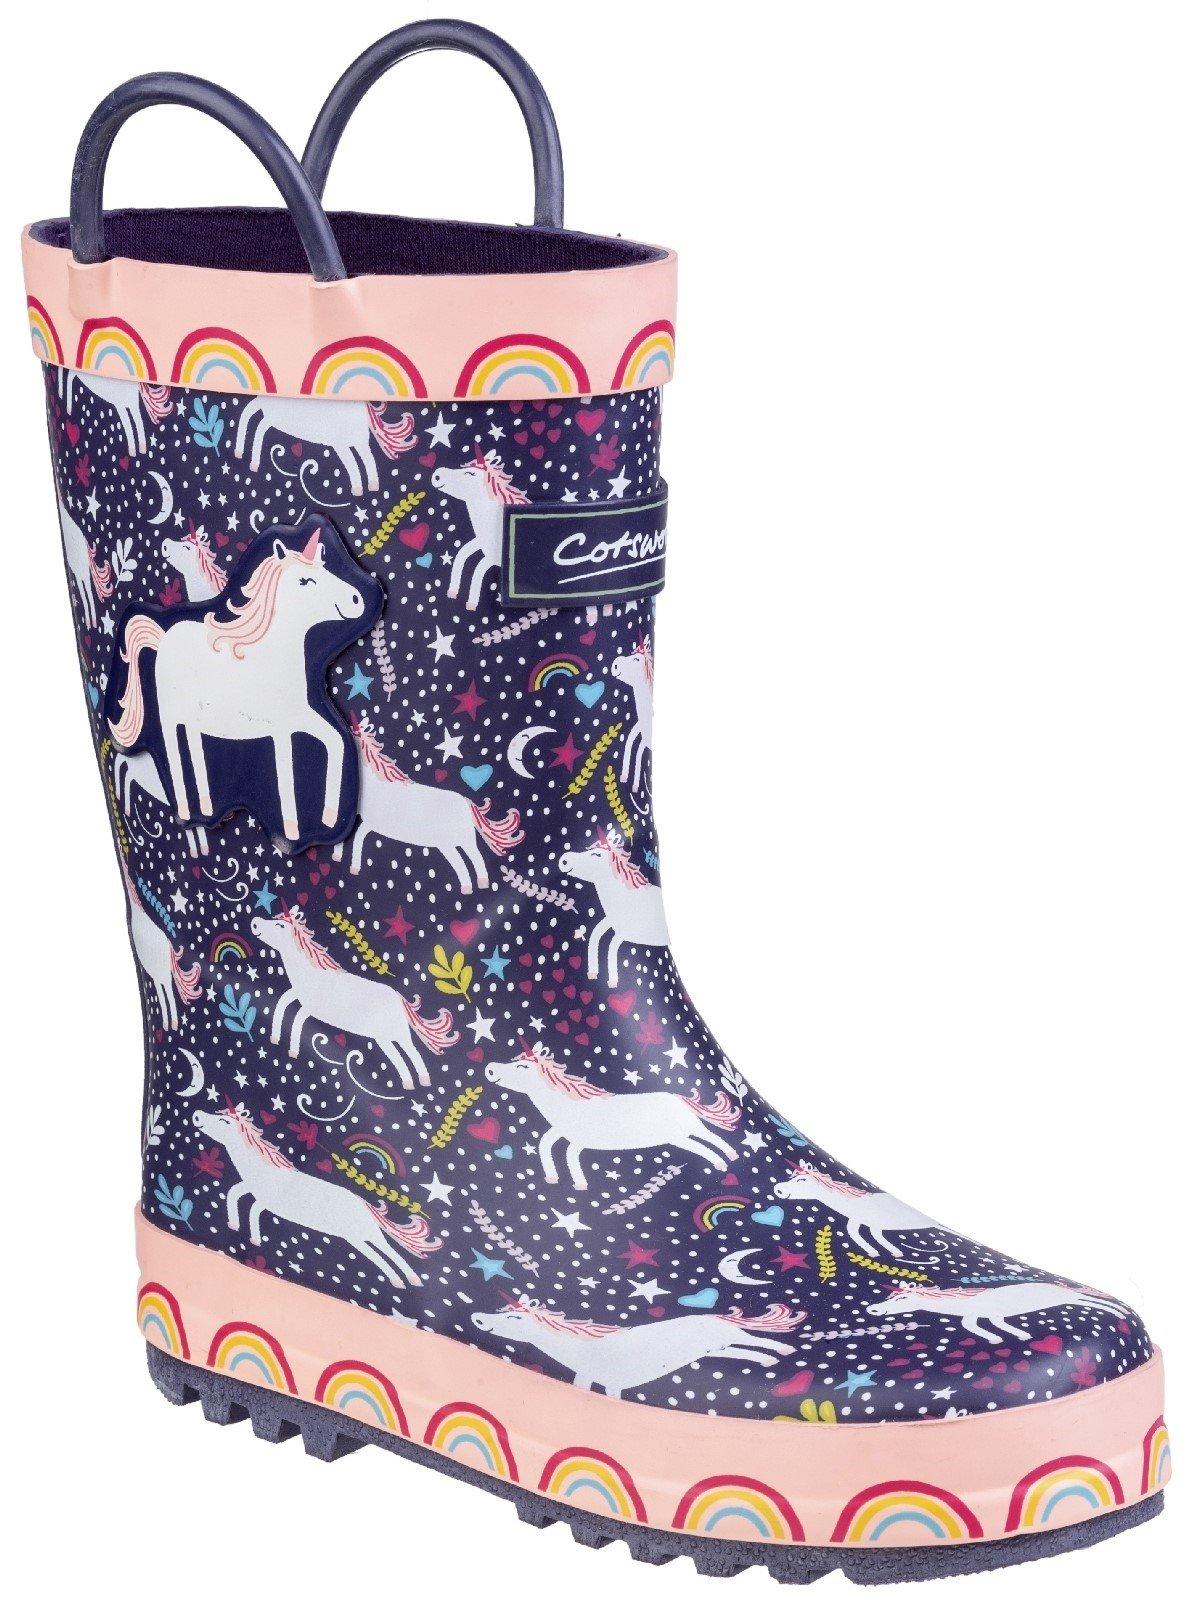 Cotswold Kids Sprinkle Junior Wellington Boot 27178 - Purple/Pink & White 6